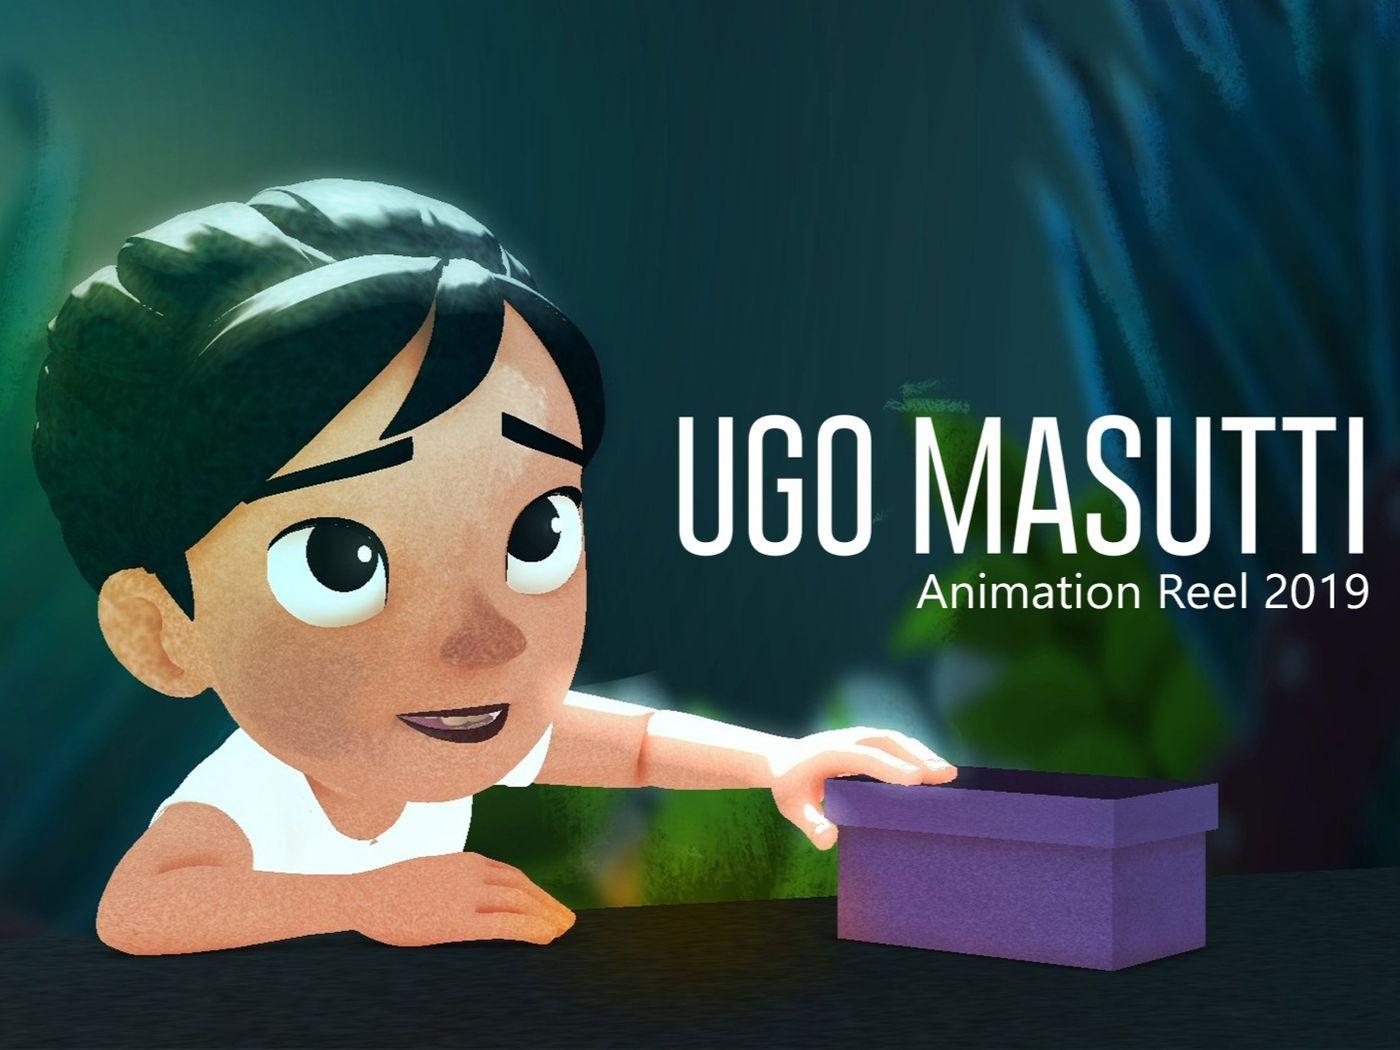 Ugo Masutti Animation Reel 2019